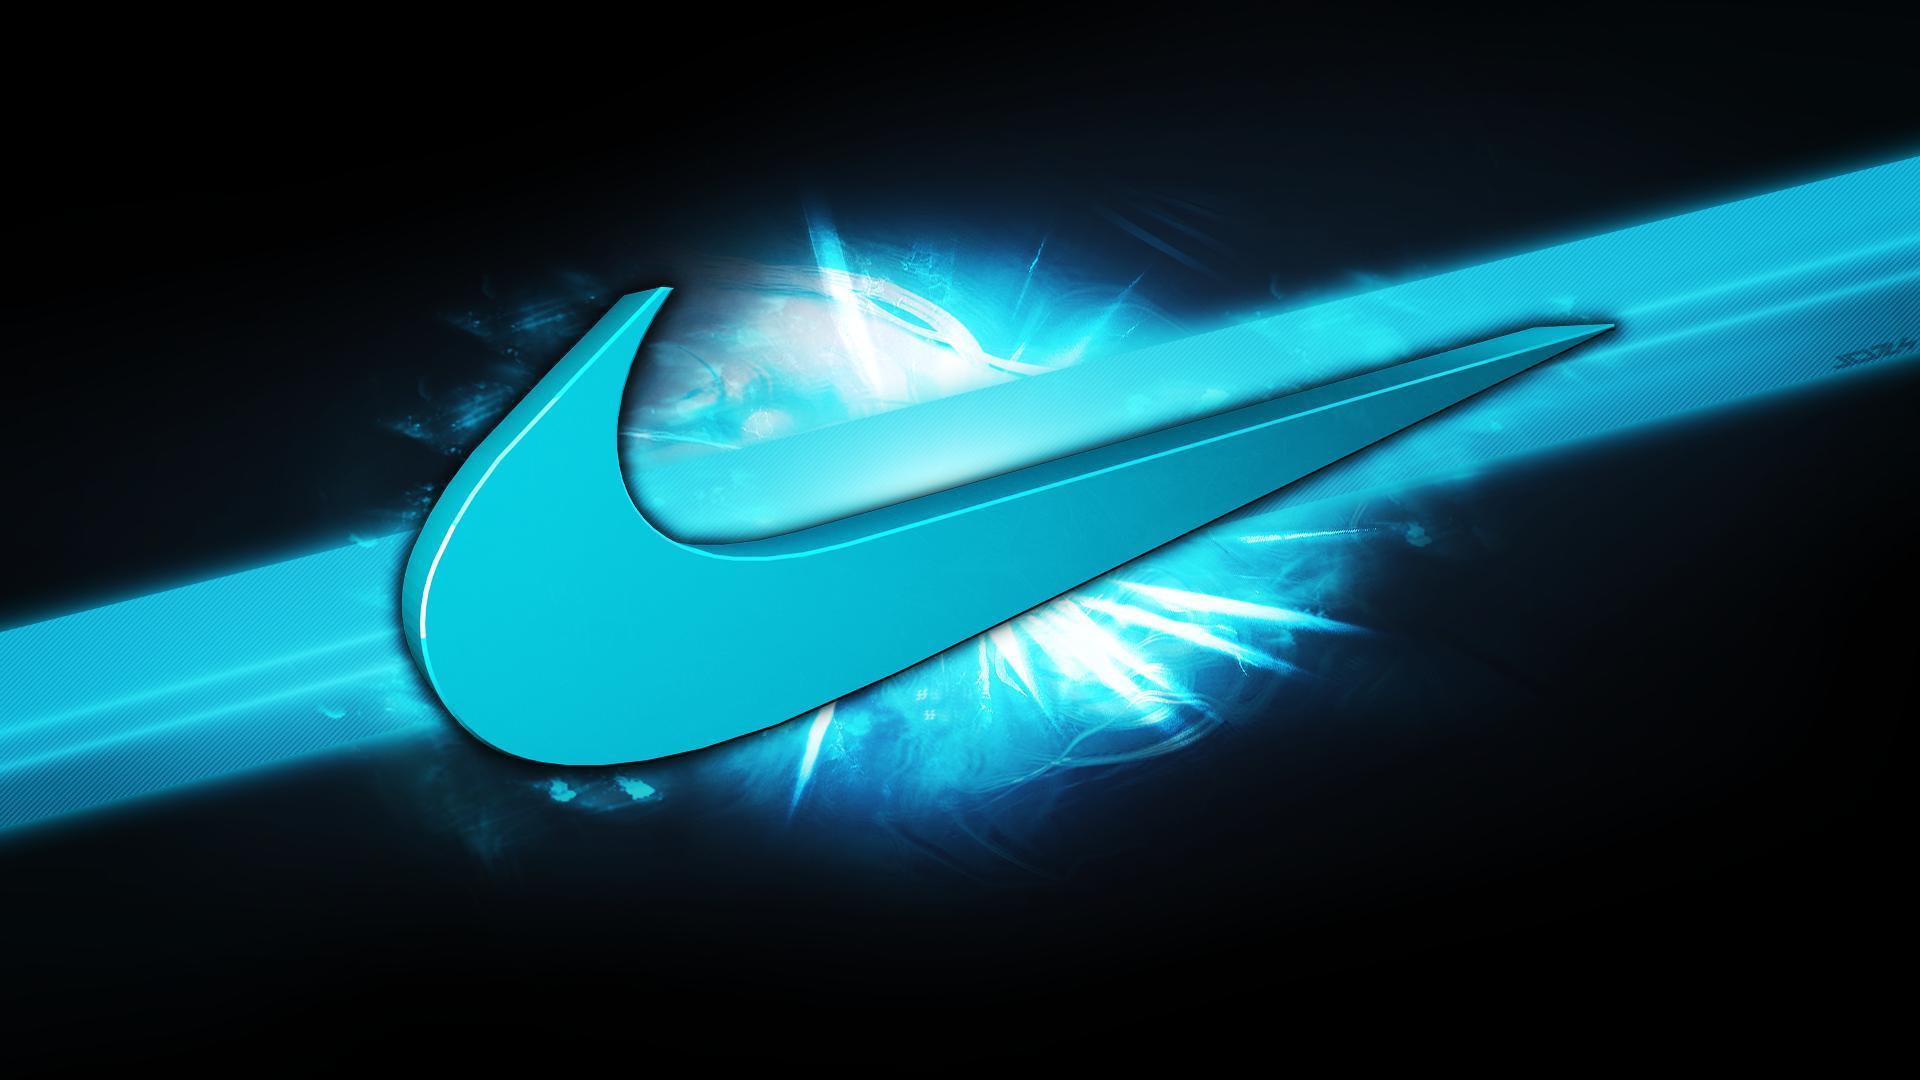 Nike Laptop Wallpapers Top Free Nike Laptop Backgrounds